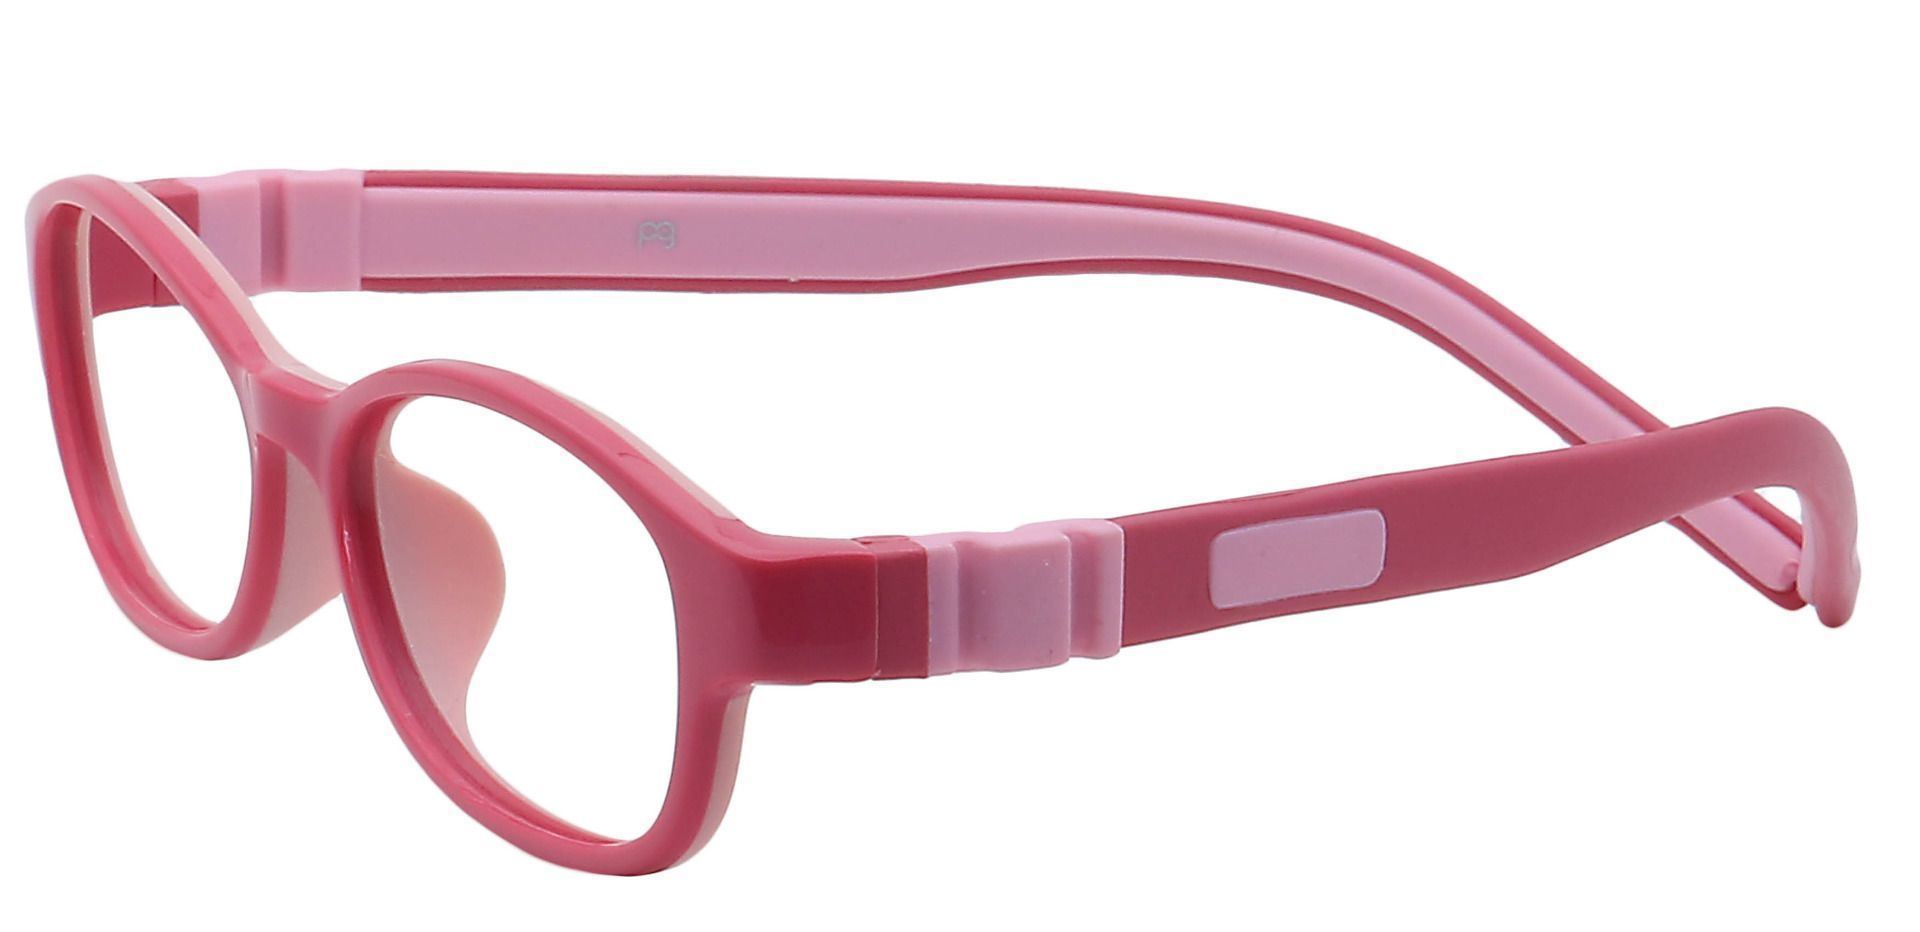 Moxie Oval Prescription Glasses - Bright Pink/pale Pink